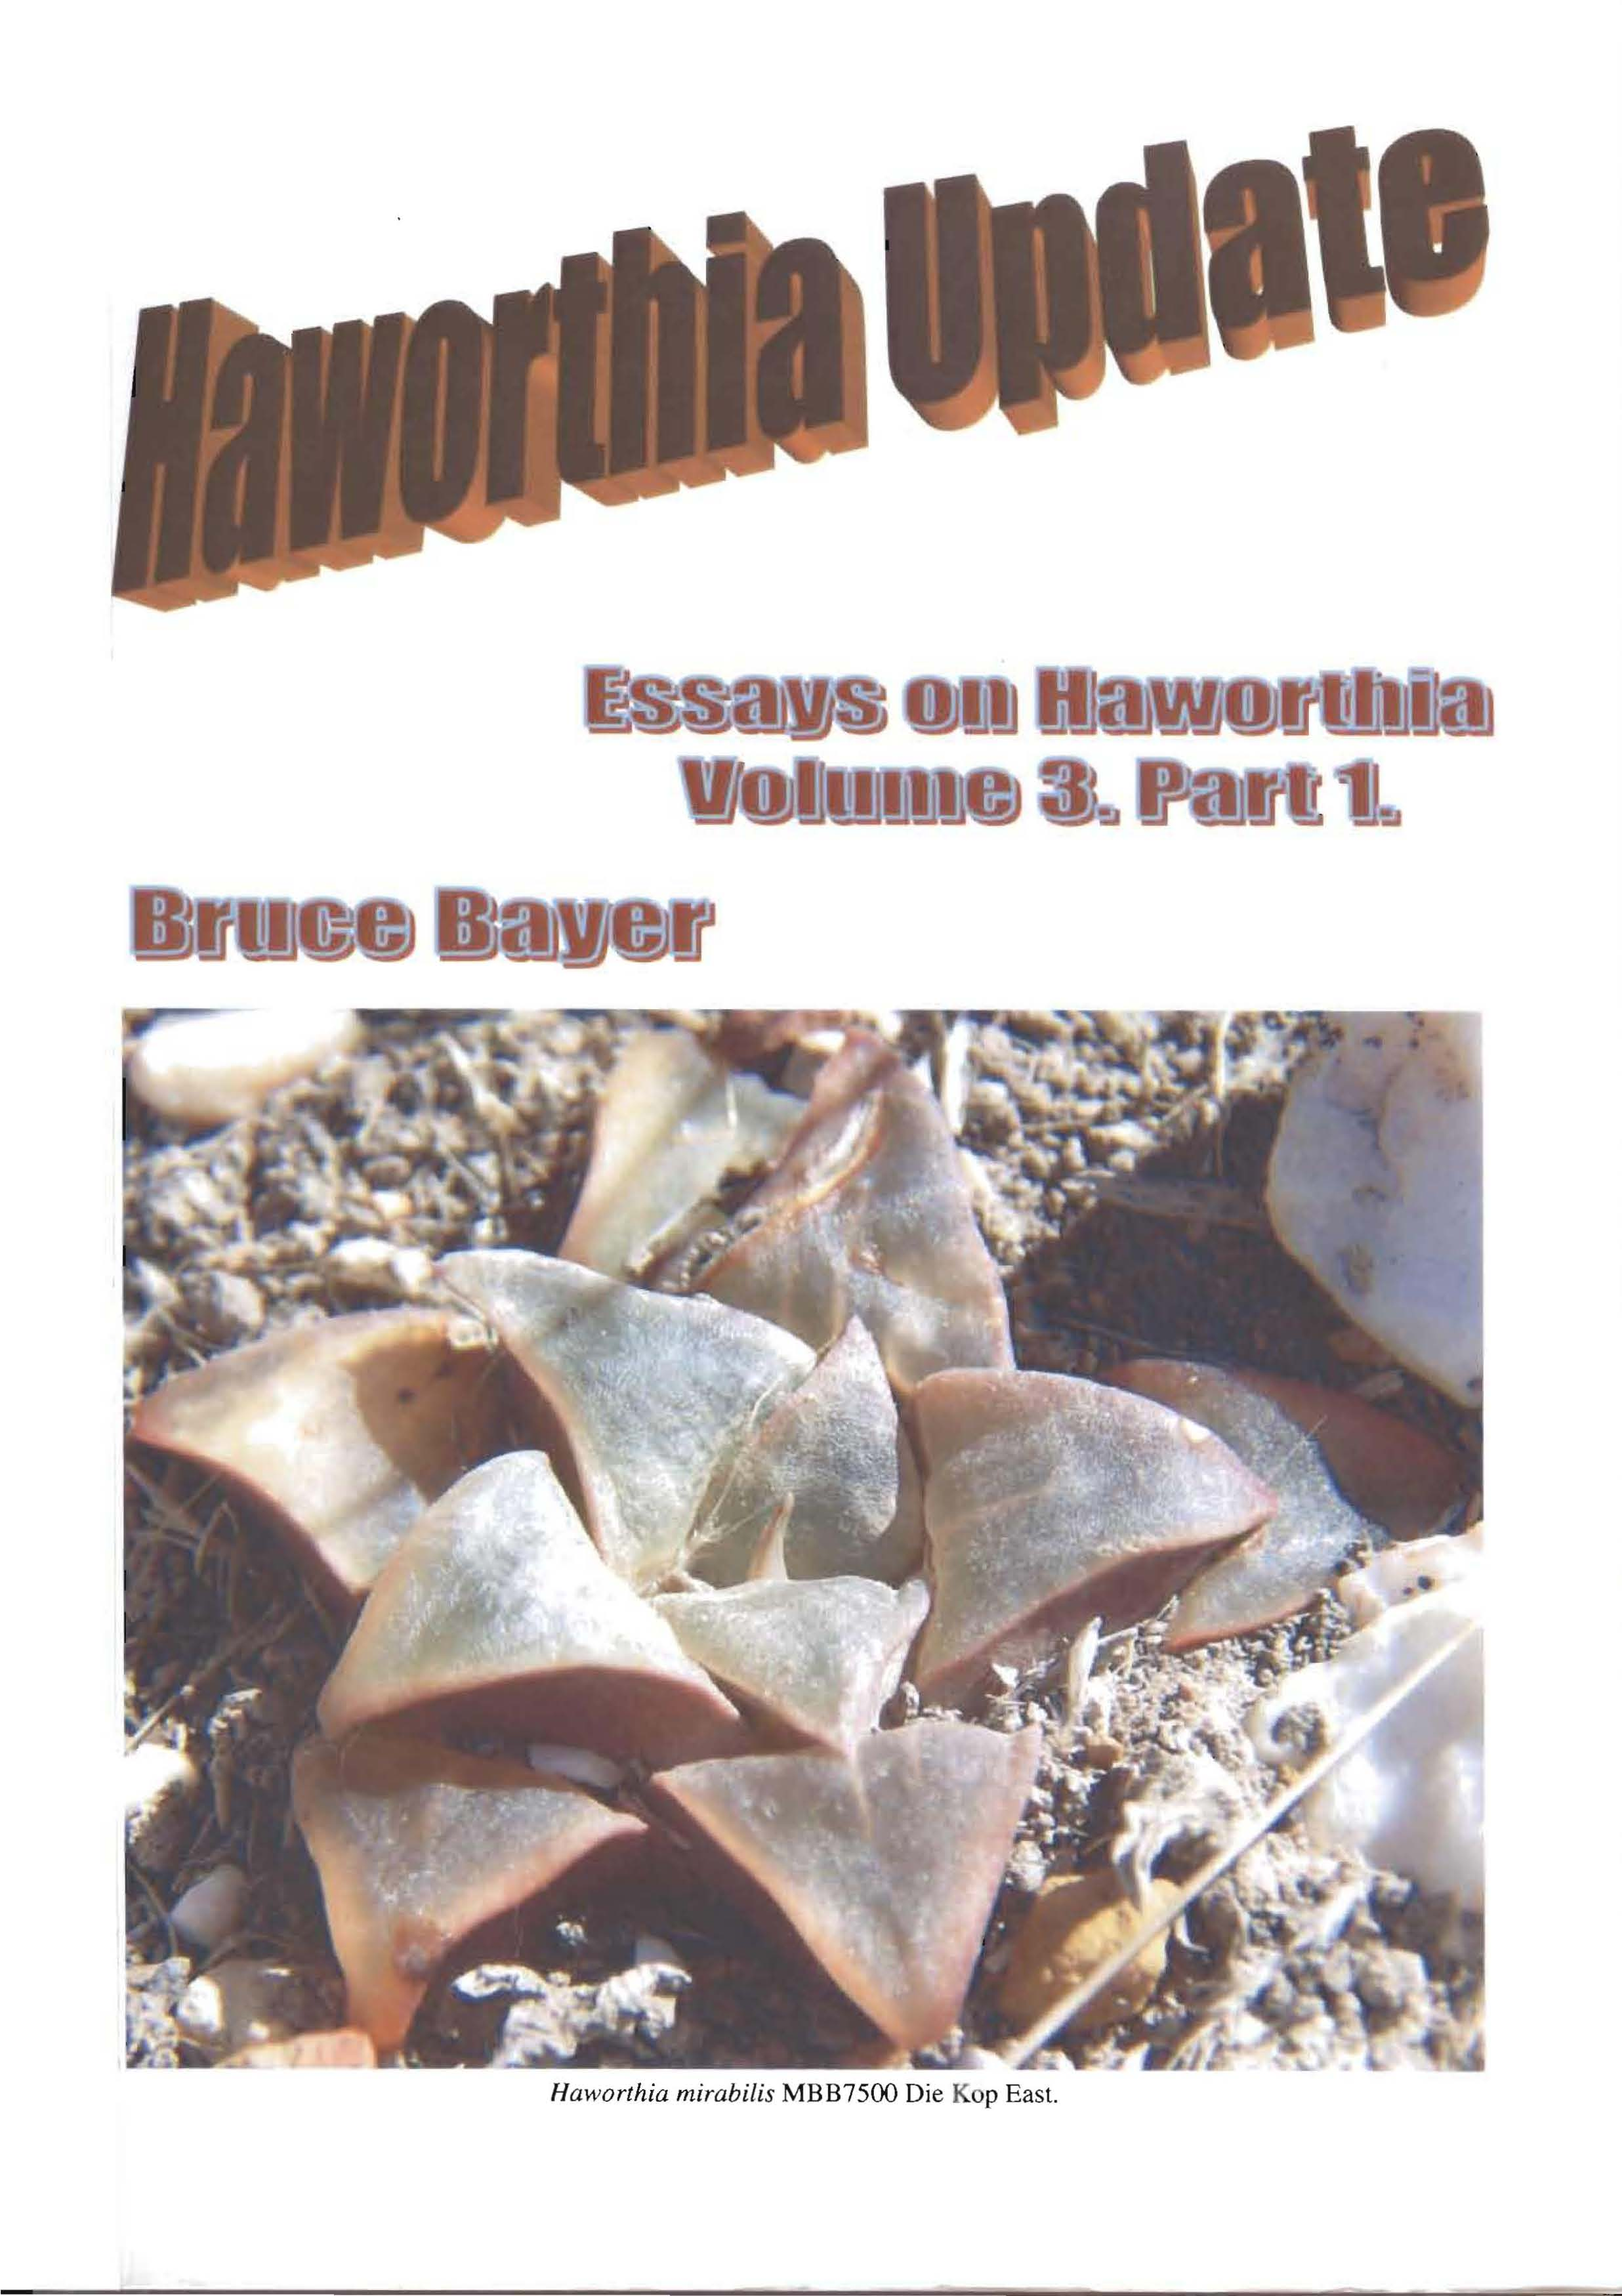 Haworthia Updates vol. 3